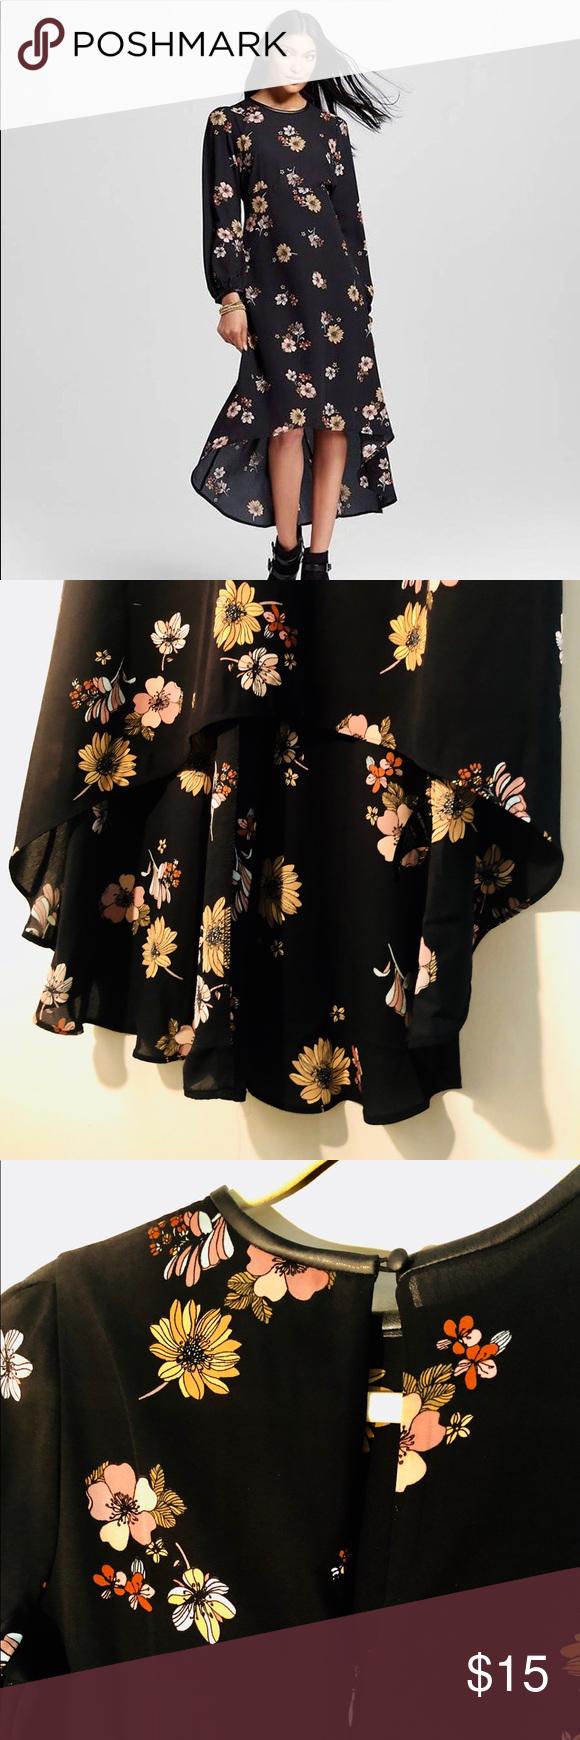 Floral High Low Hem Dress Who What Wear For Target Black Floral Dress With Asymmetric Hemline Long Sleeves And Ke High Low Hem Dresses Target Dresses Dresses [ 1740 x 580 Pixel ]